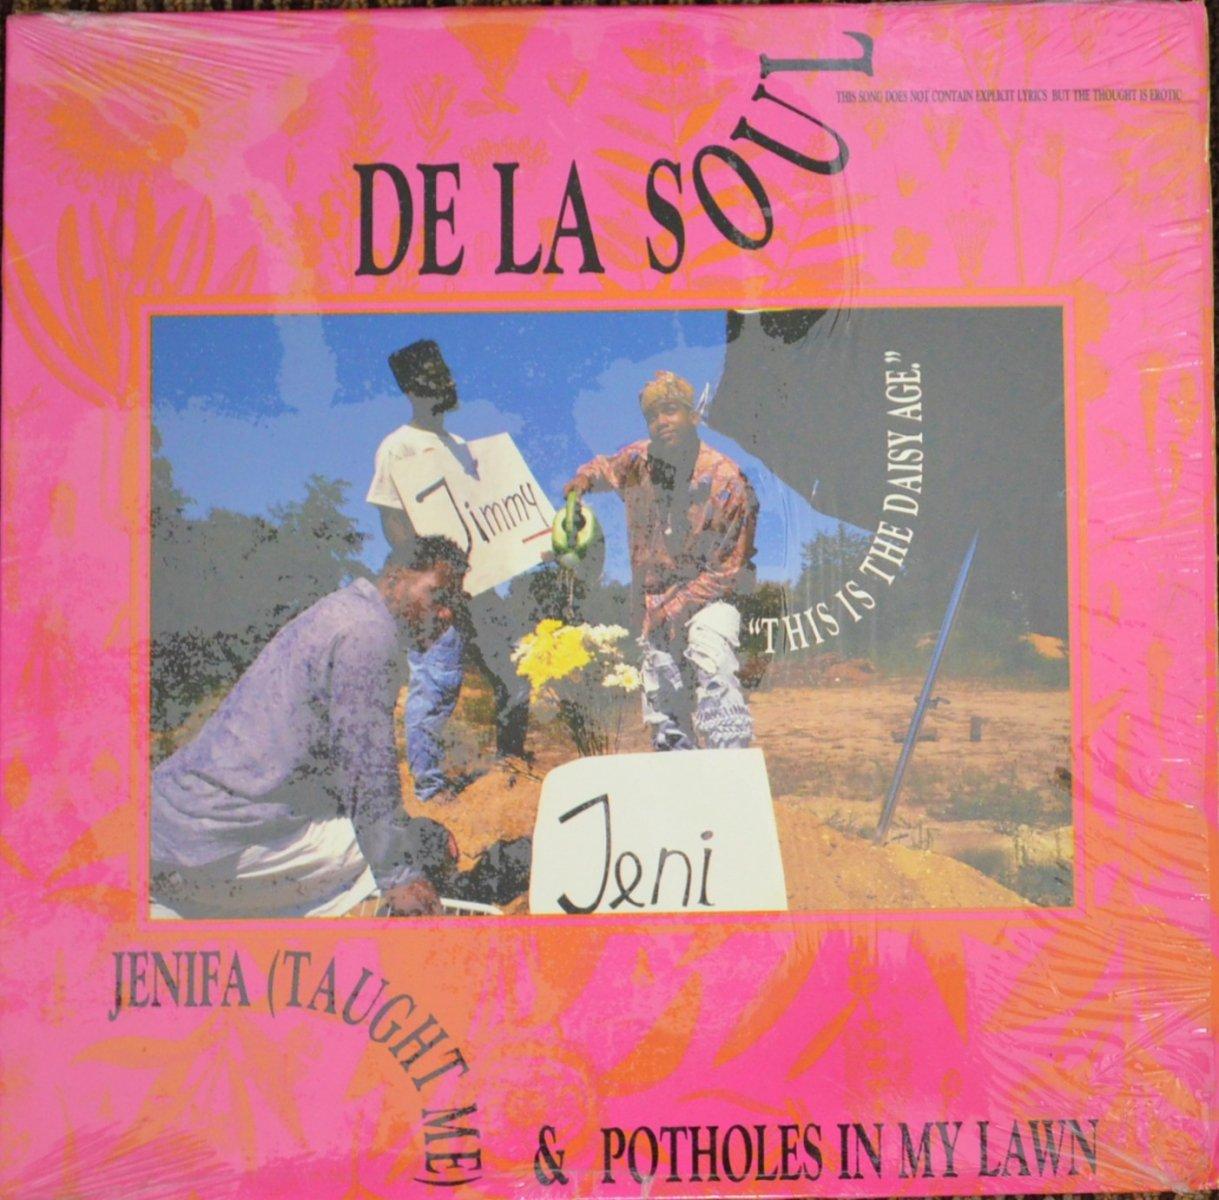 DE LA SOUL / JENIFA (TAUGHT ME) / POTHOLES IN MY LAWN (12